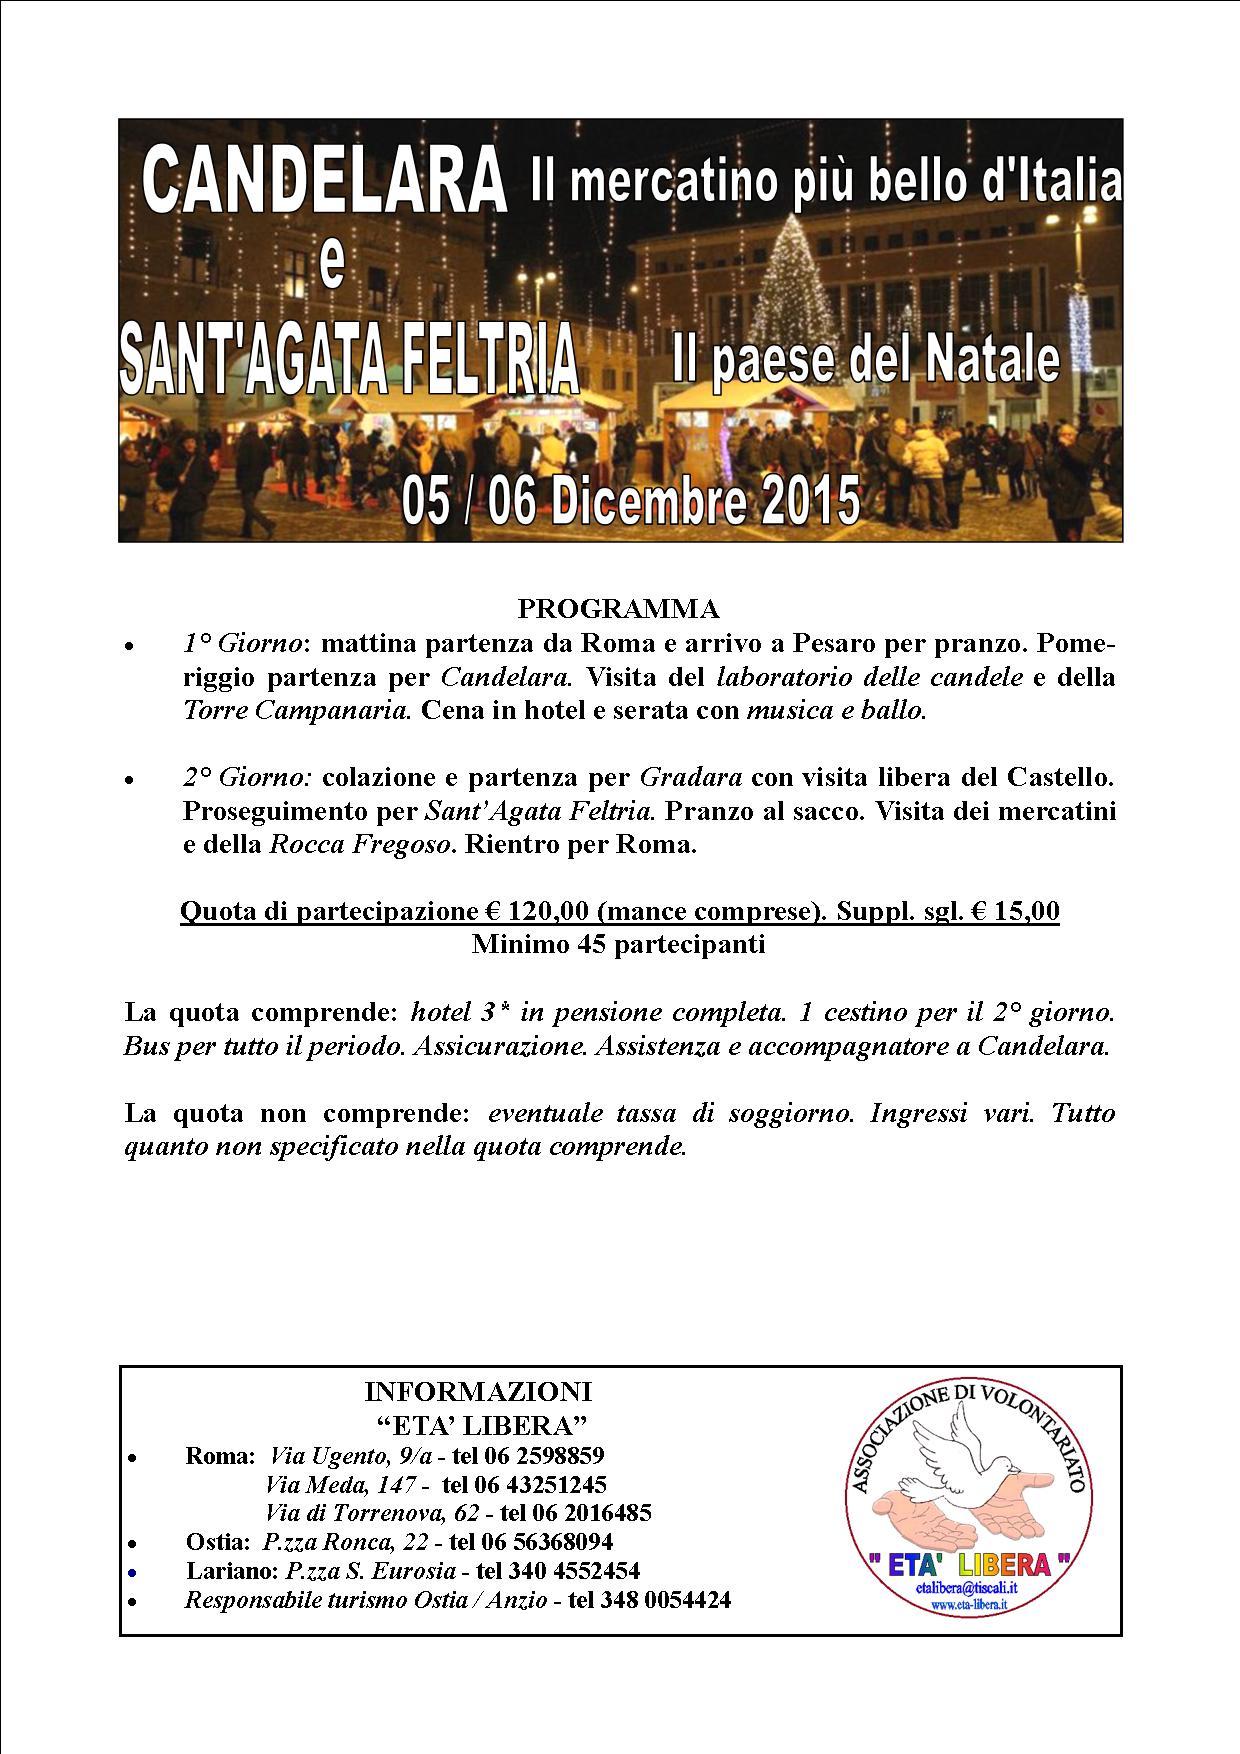 http://www.eta-libera.it/wp-content/uploads/2015/02/Candelara.jpg